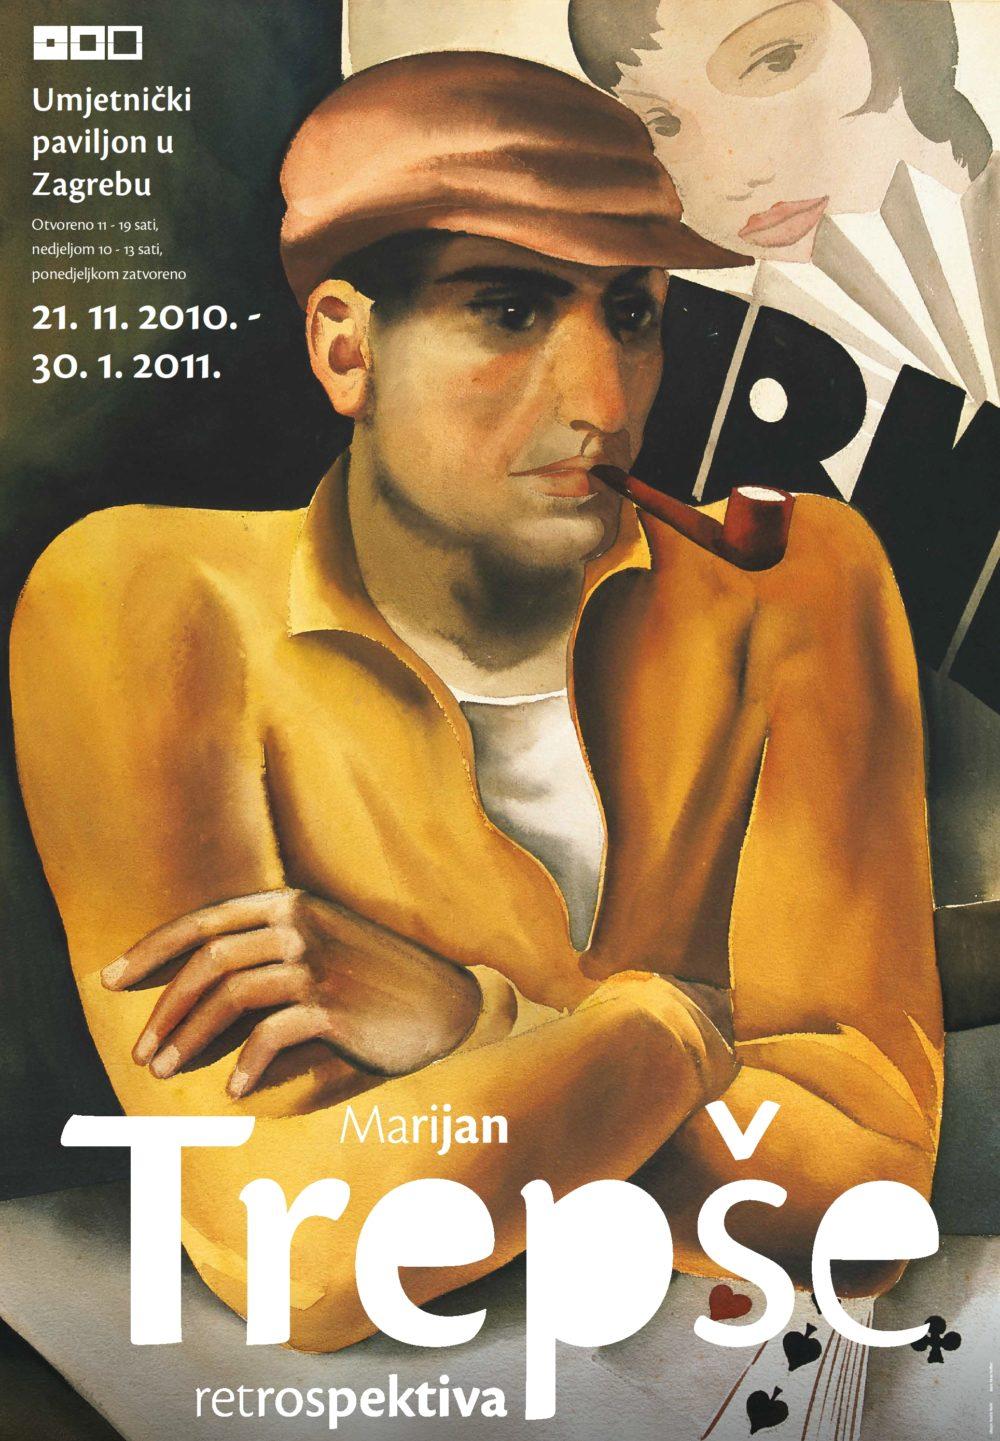 Marijan Trepše 2010 plakat